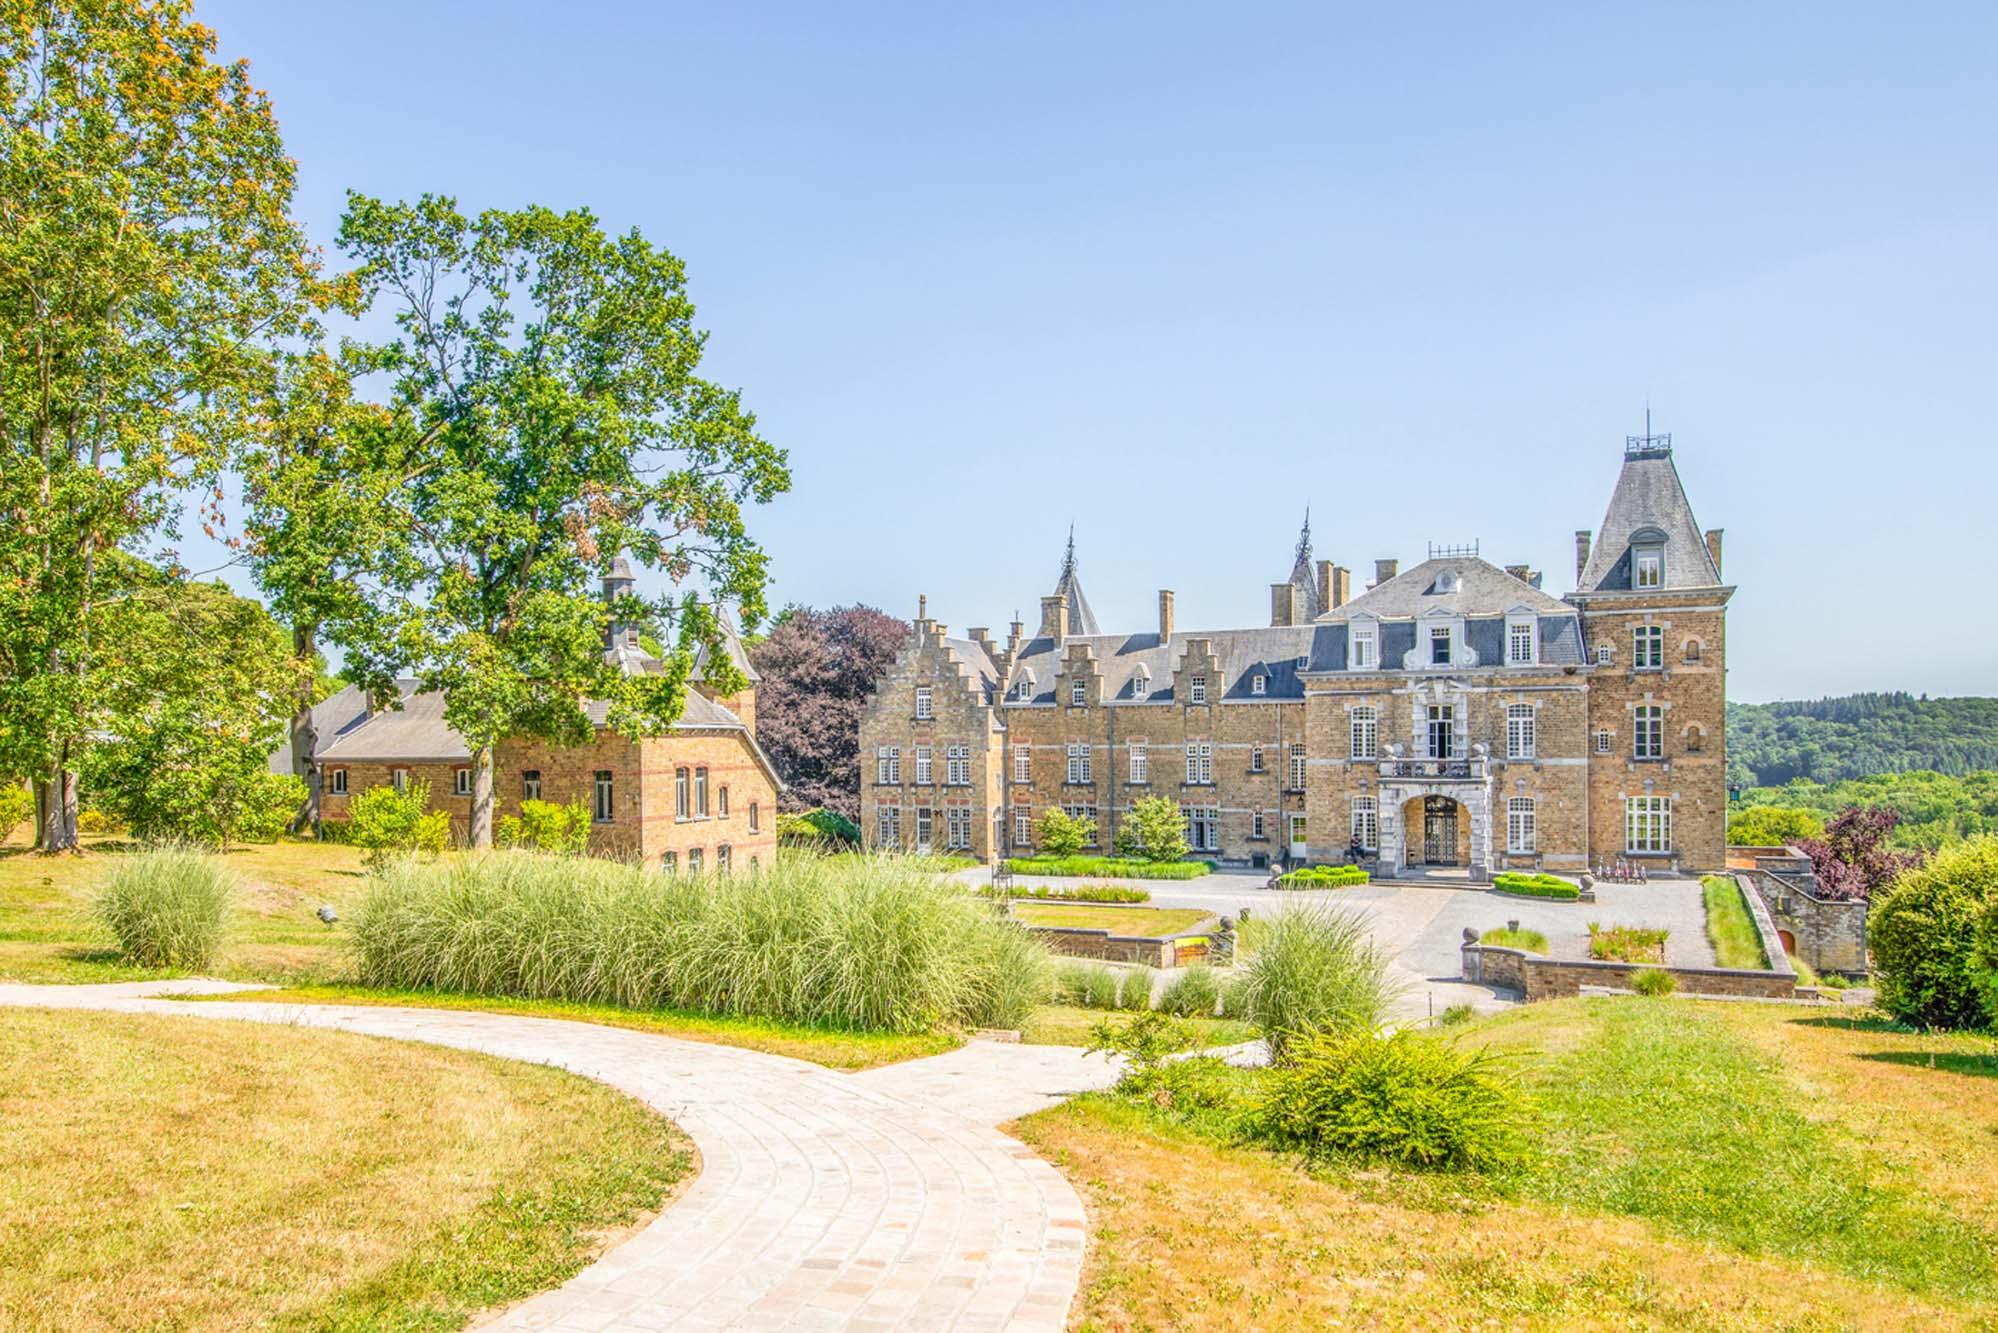 Domaine-de-Ronchinne-Chateau.jpg